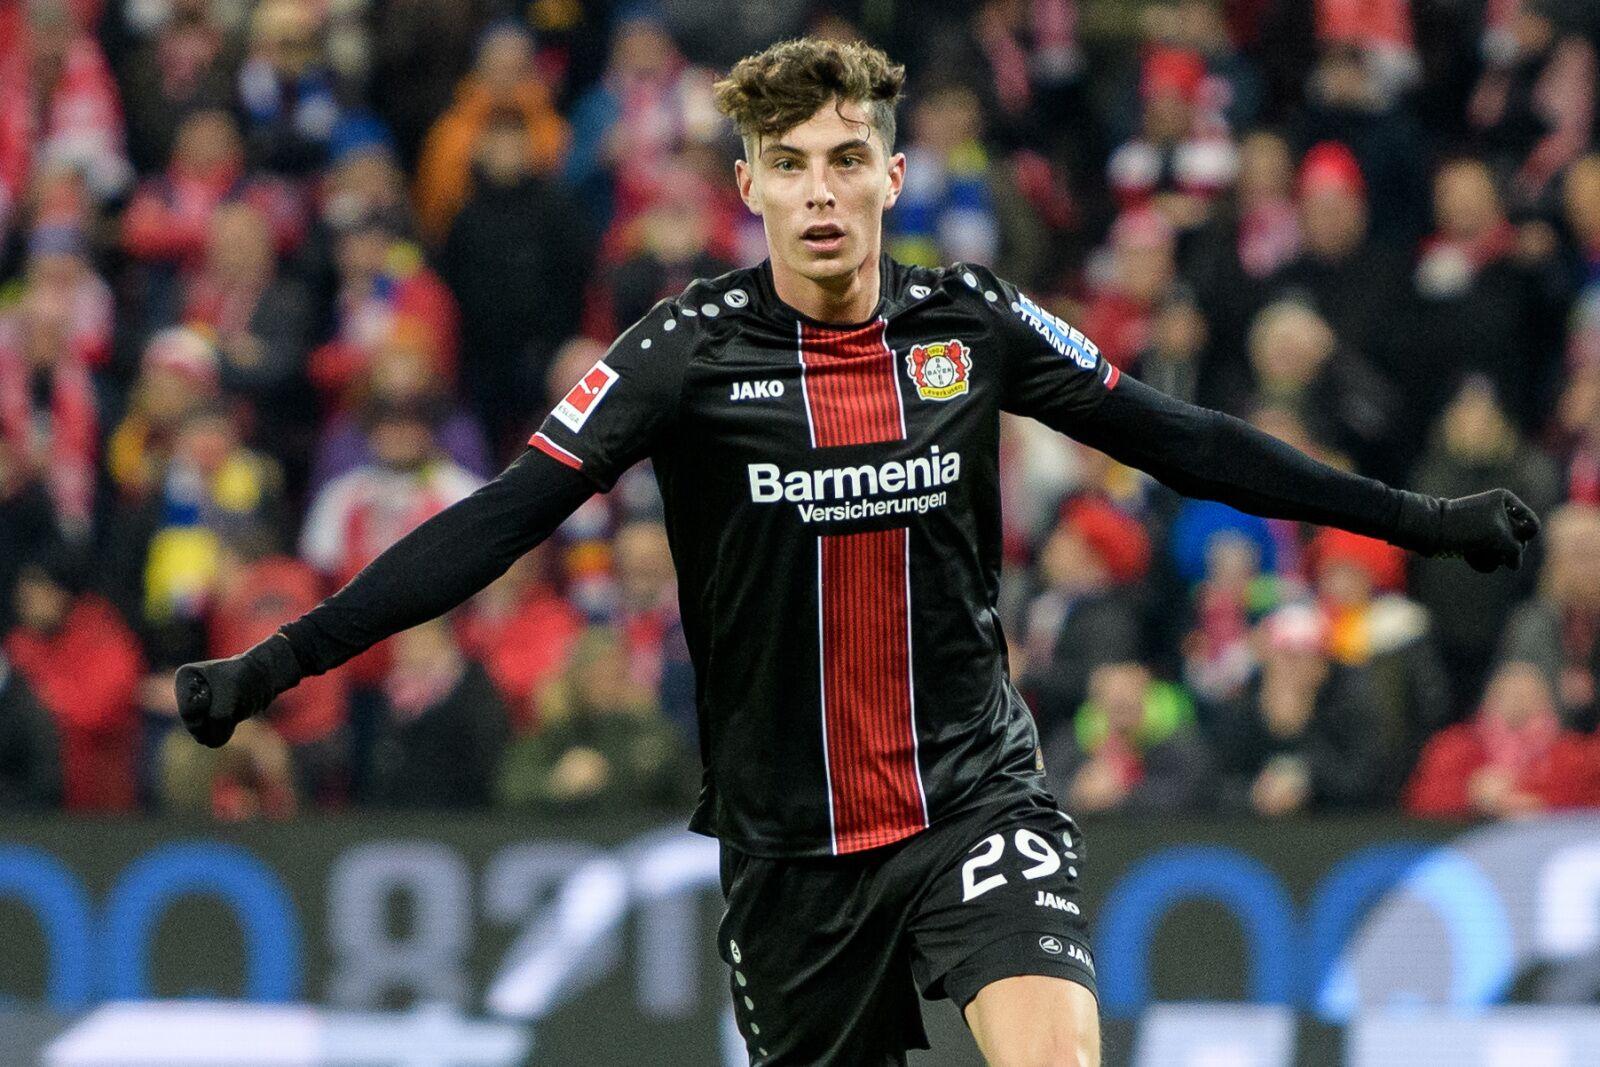 Liverpool taking an interest in Leverkusen's Kai Havertz